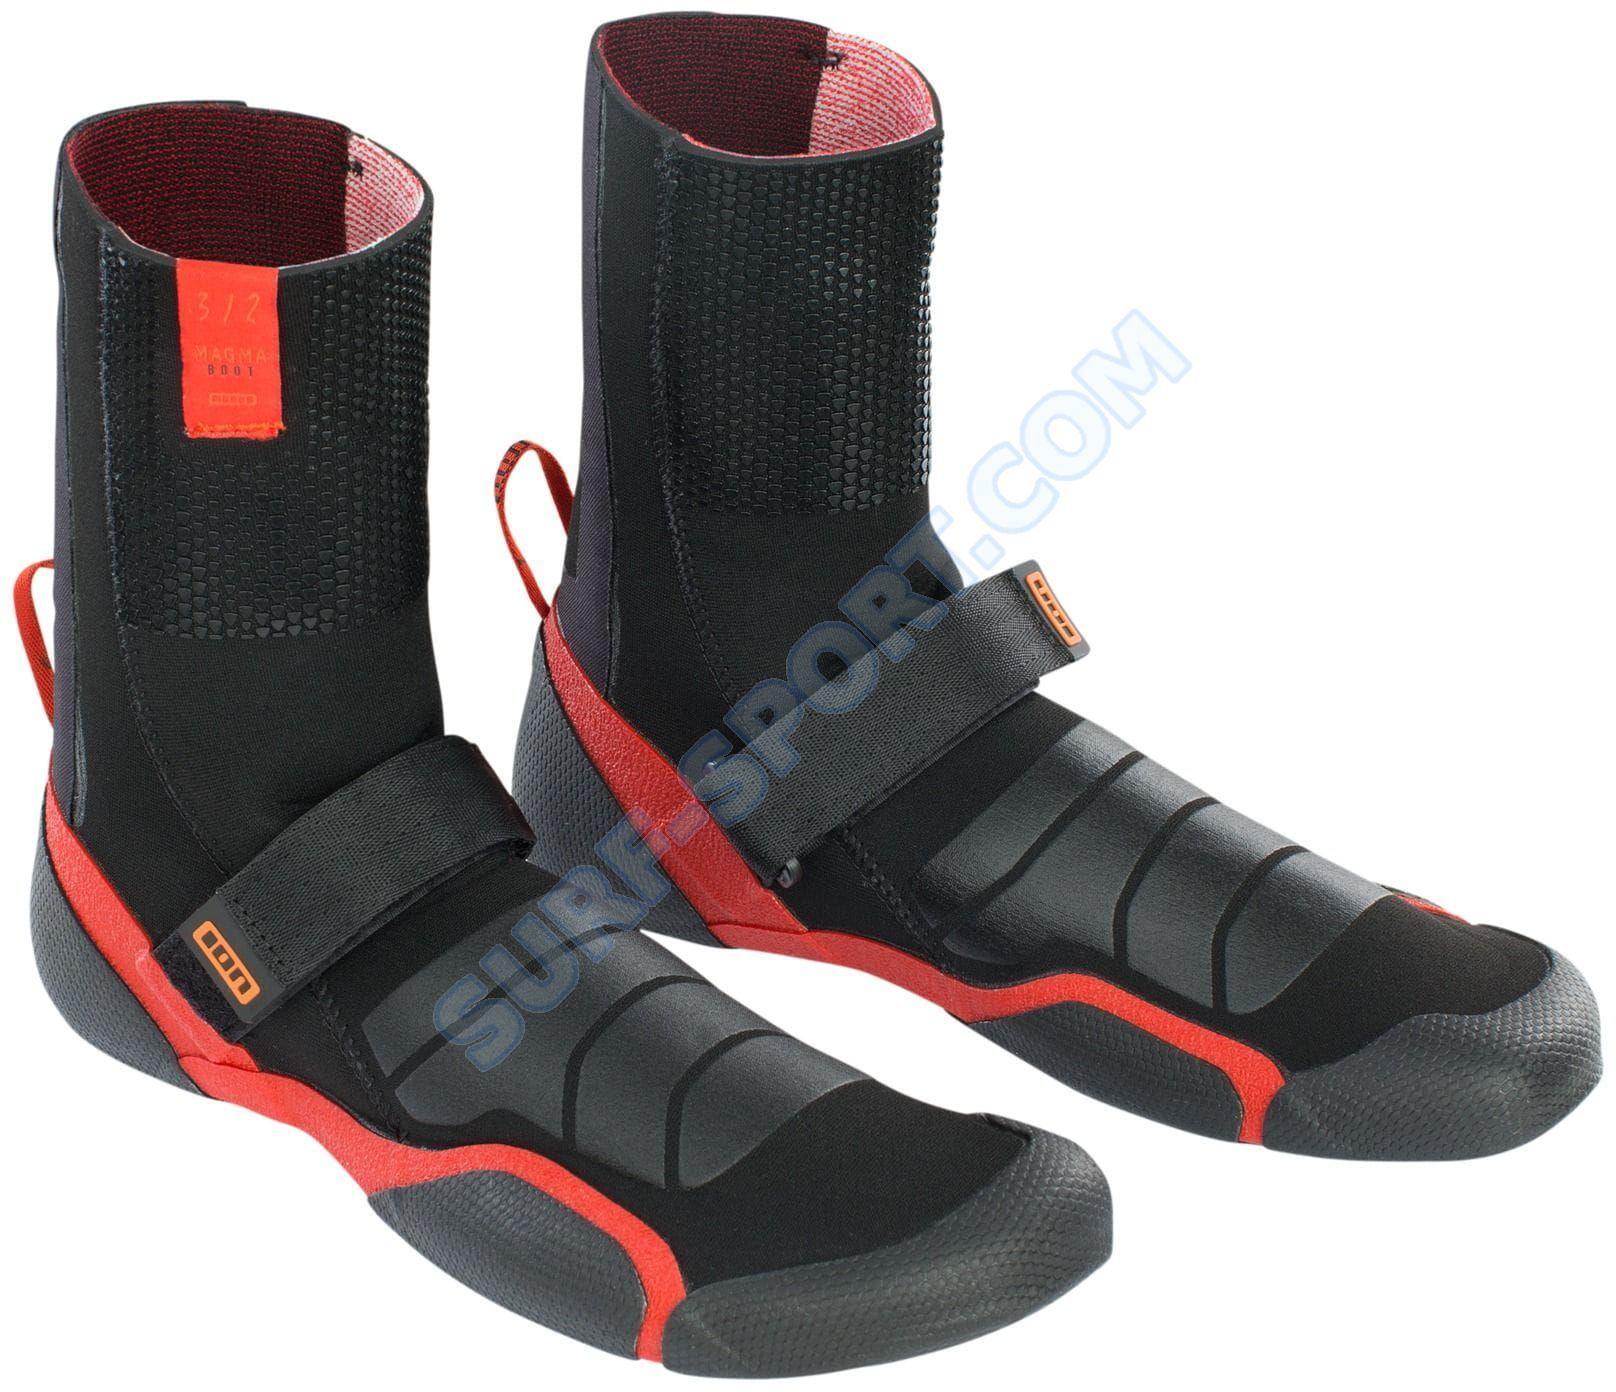 Buty Neoprenowe Wysokie ION Magma Boots 3/2 RT -2020